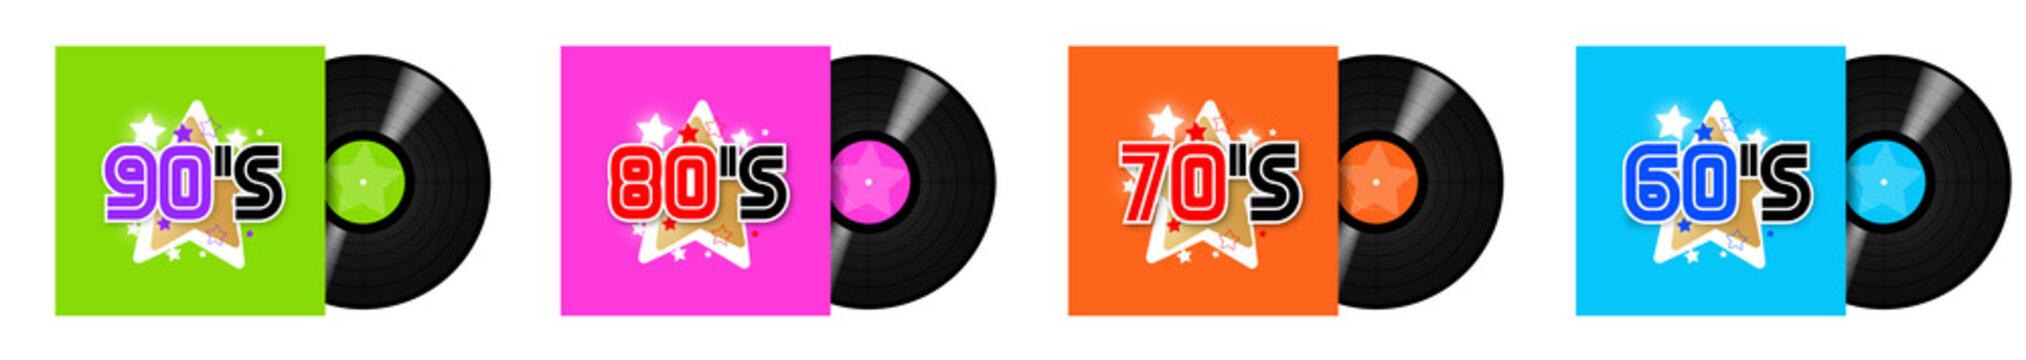 "60's, 70's, 80's, 90""s Record LP / 33 tours"